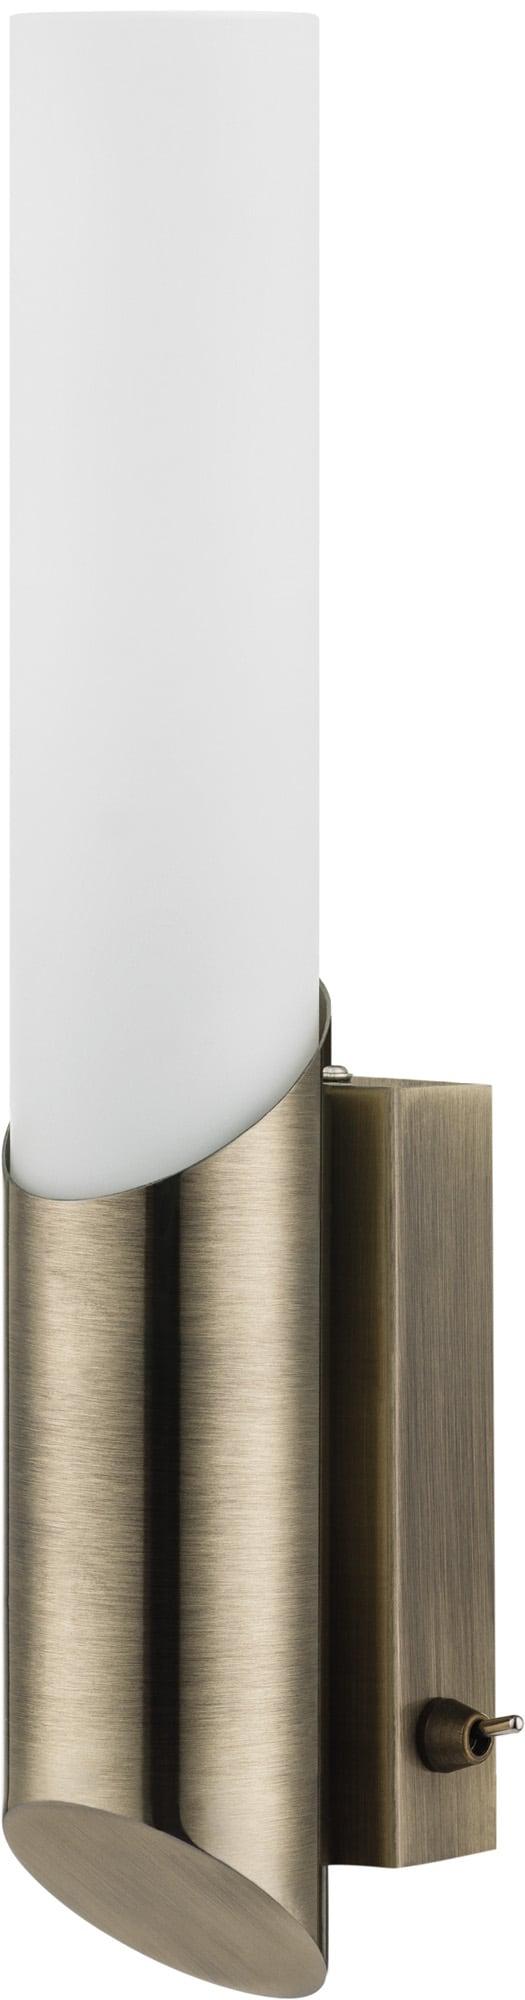 Lampa de perete Patina Patina acvatică / alb E14 40W